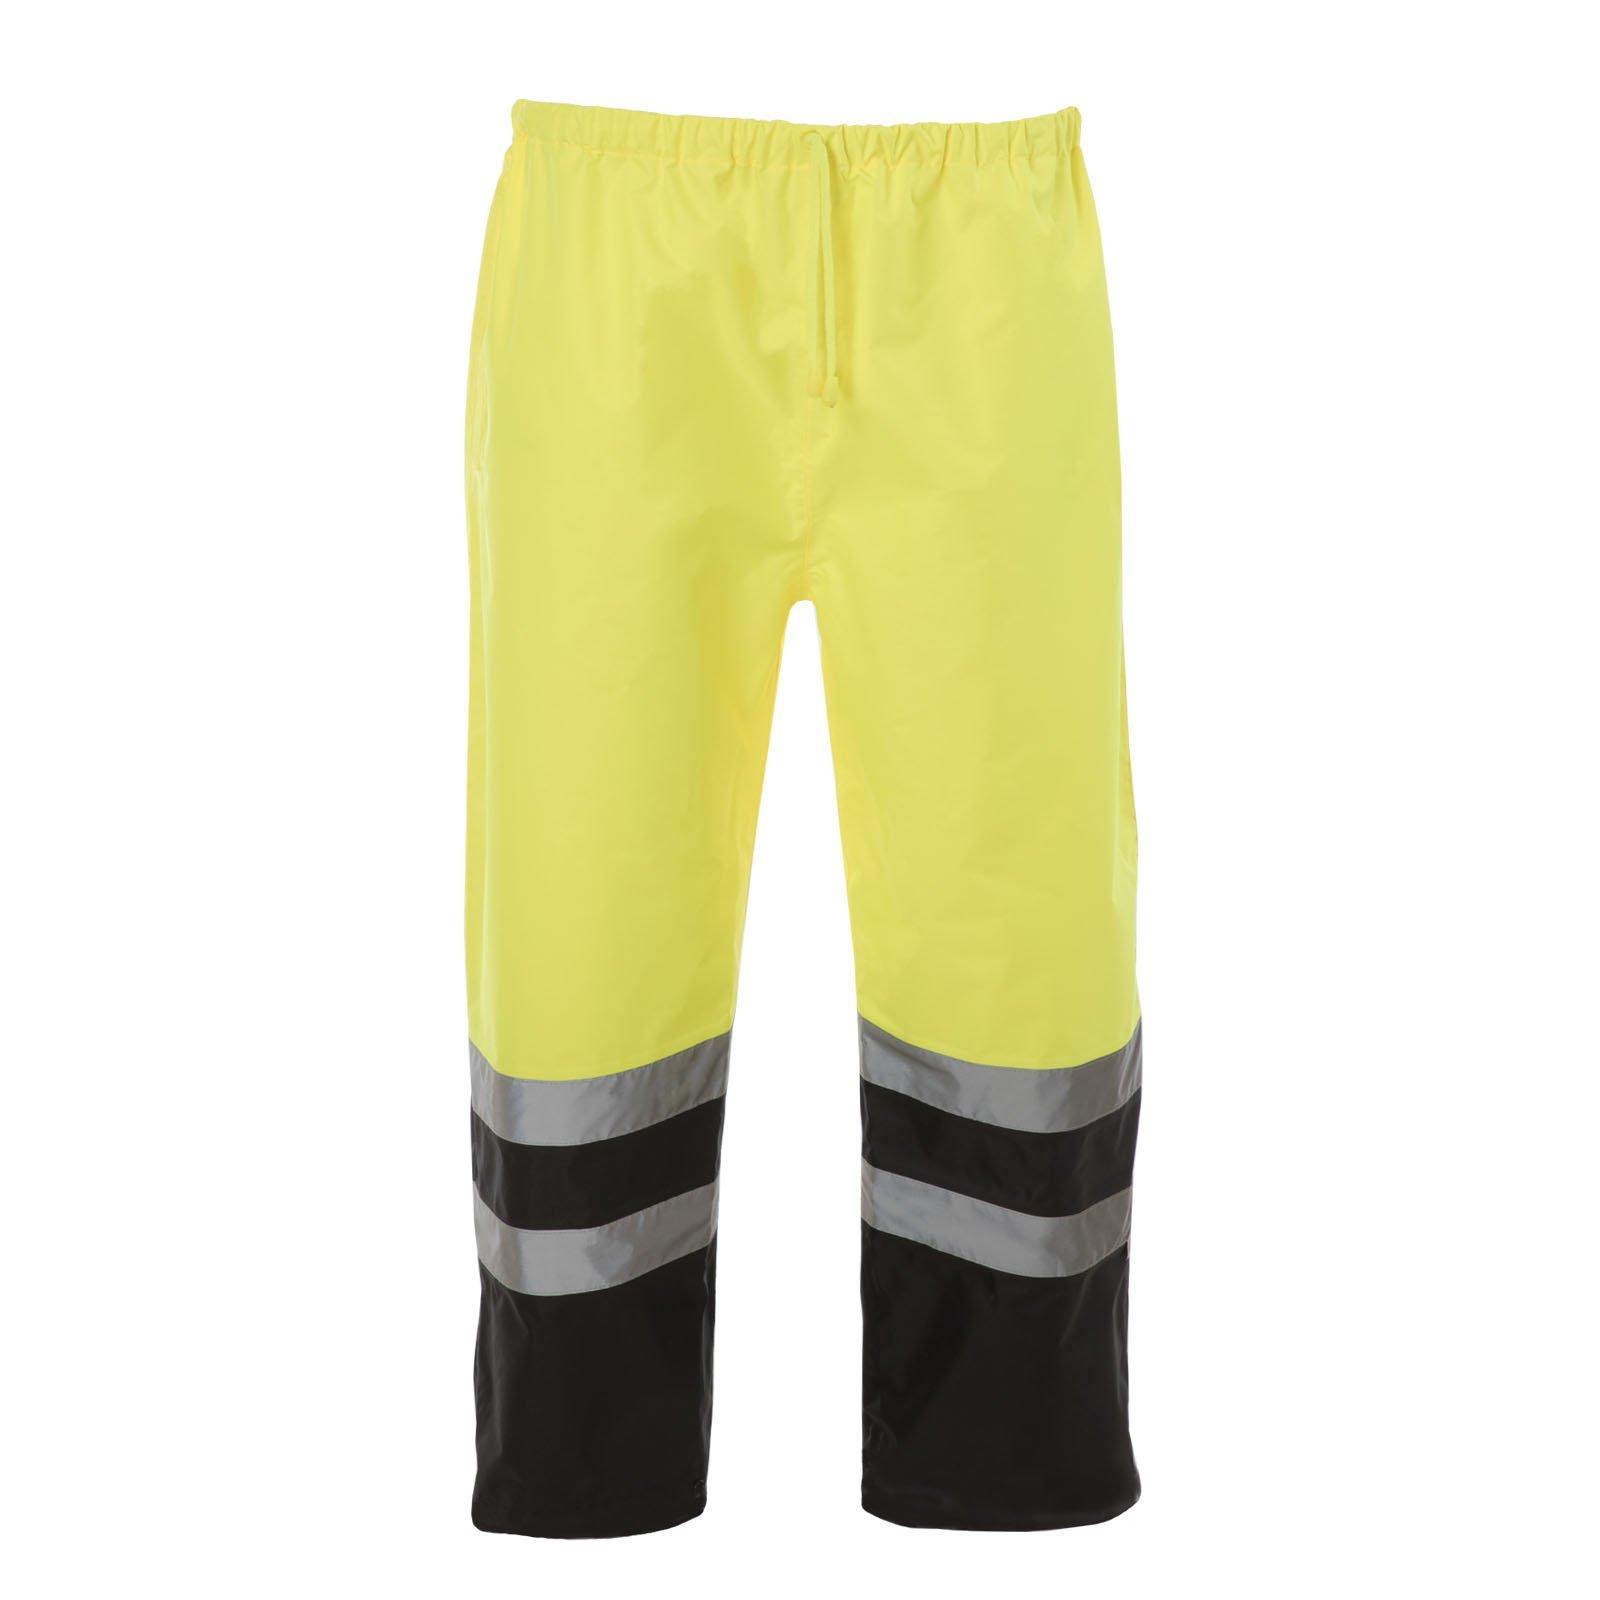 JORESTECH Light Weight Waterproof Rain Pants ANSI/ISEA 107-2015 Class 3 Level 2 Black and Yellow (3X-Large)